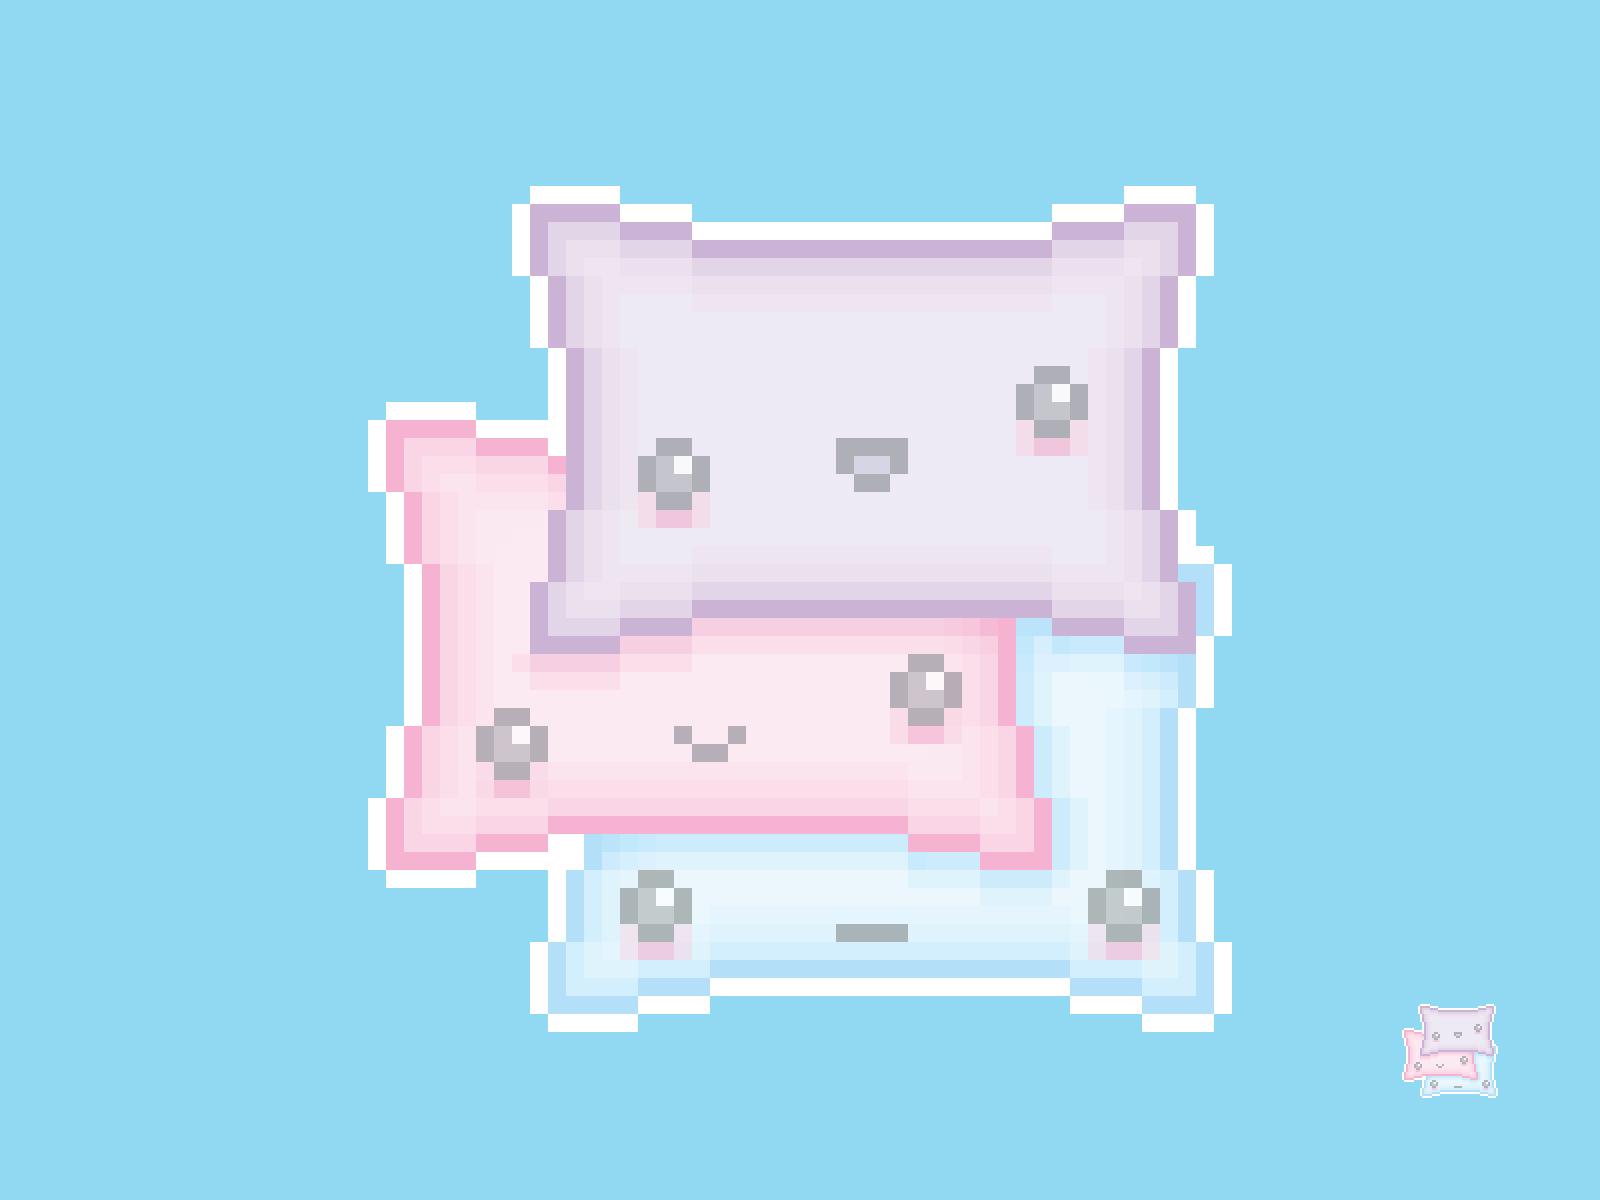 Pillows Pixel